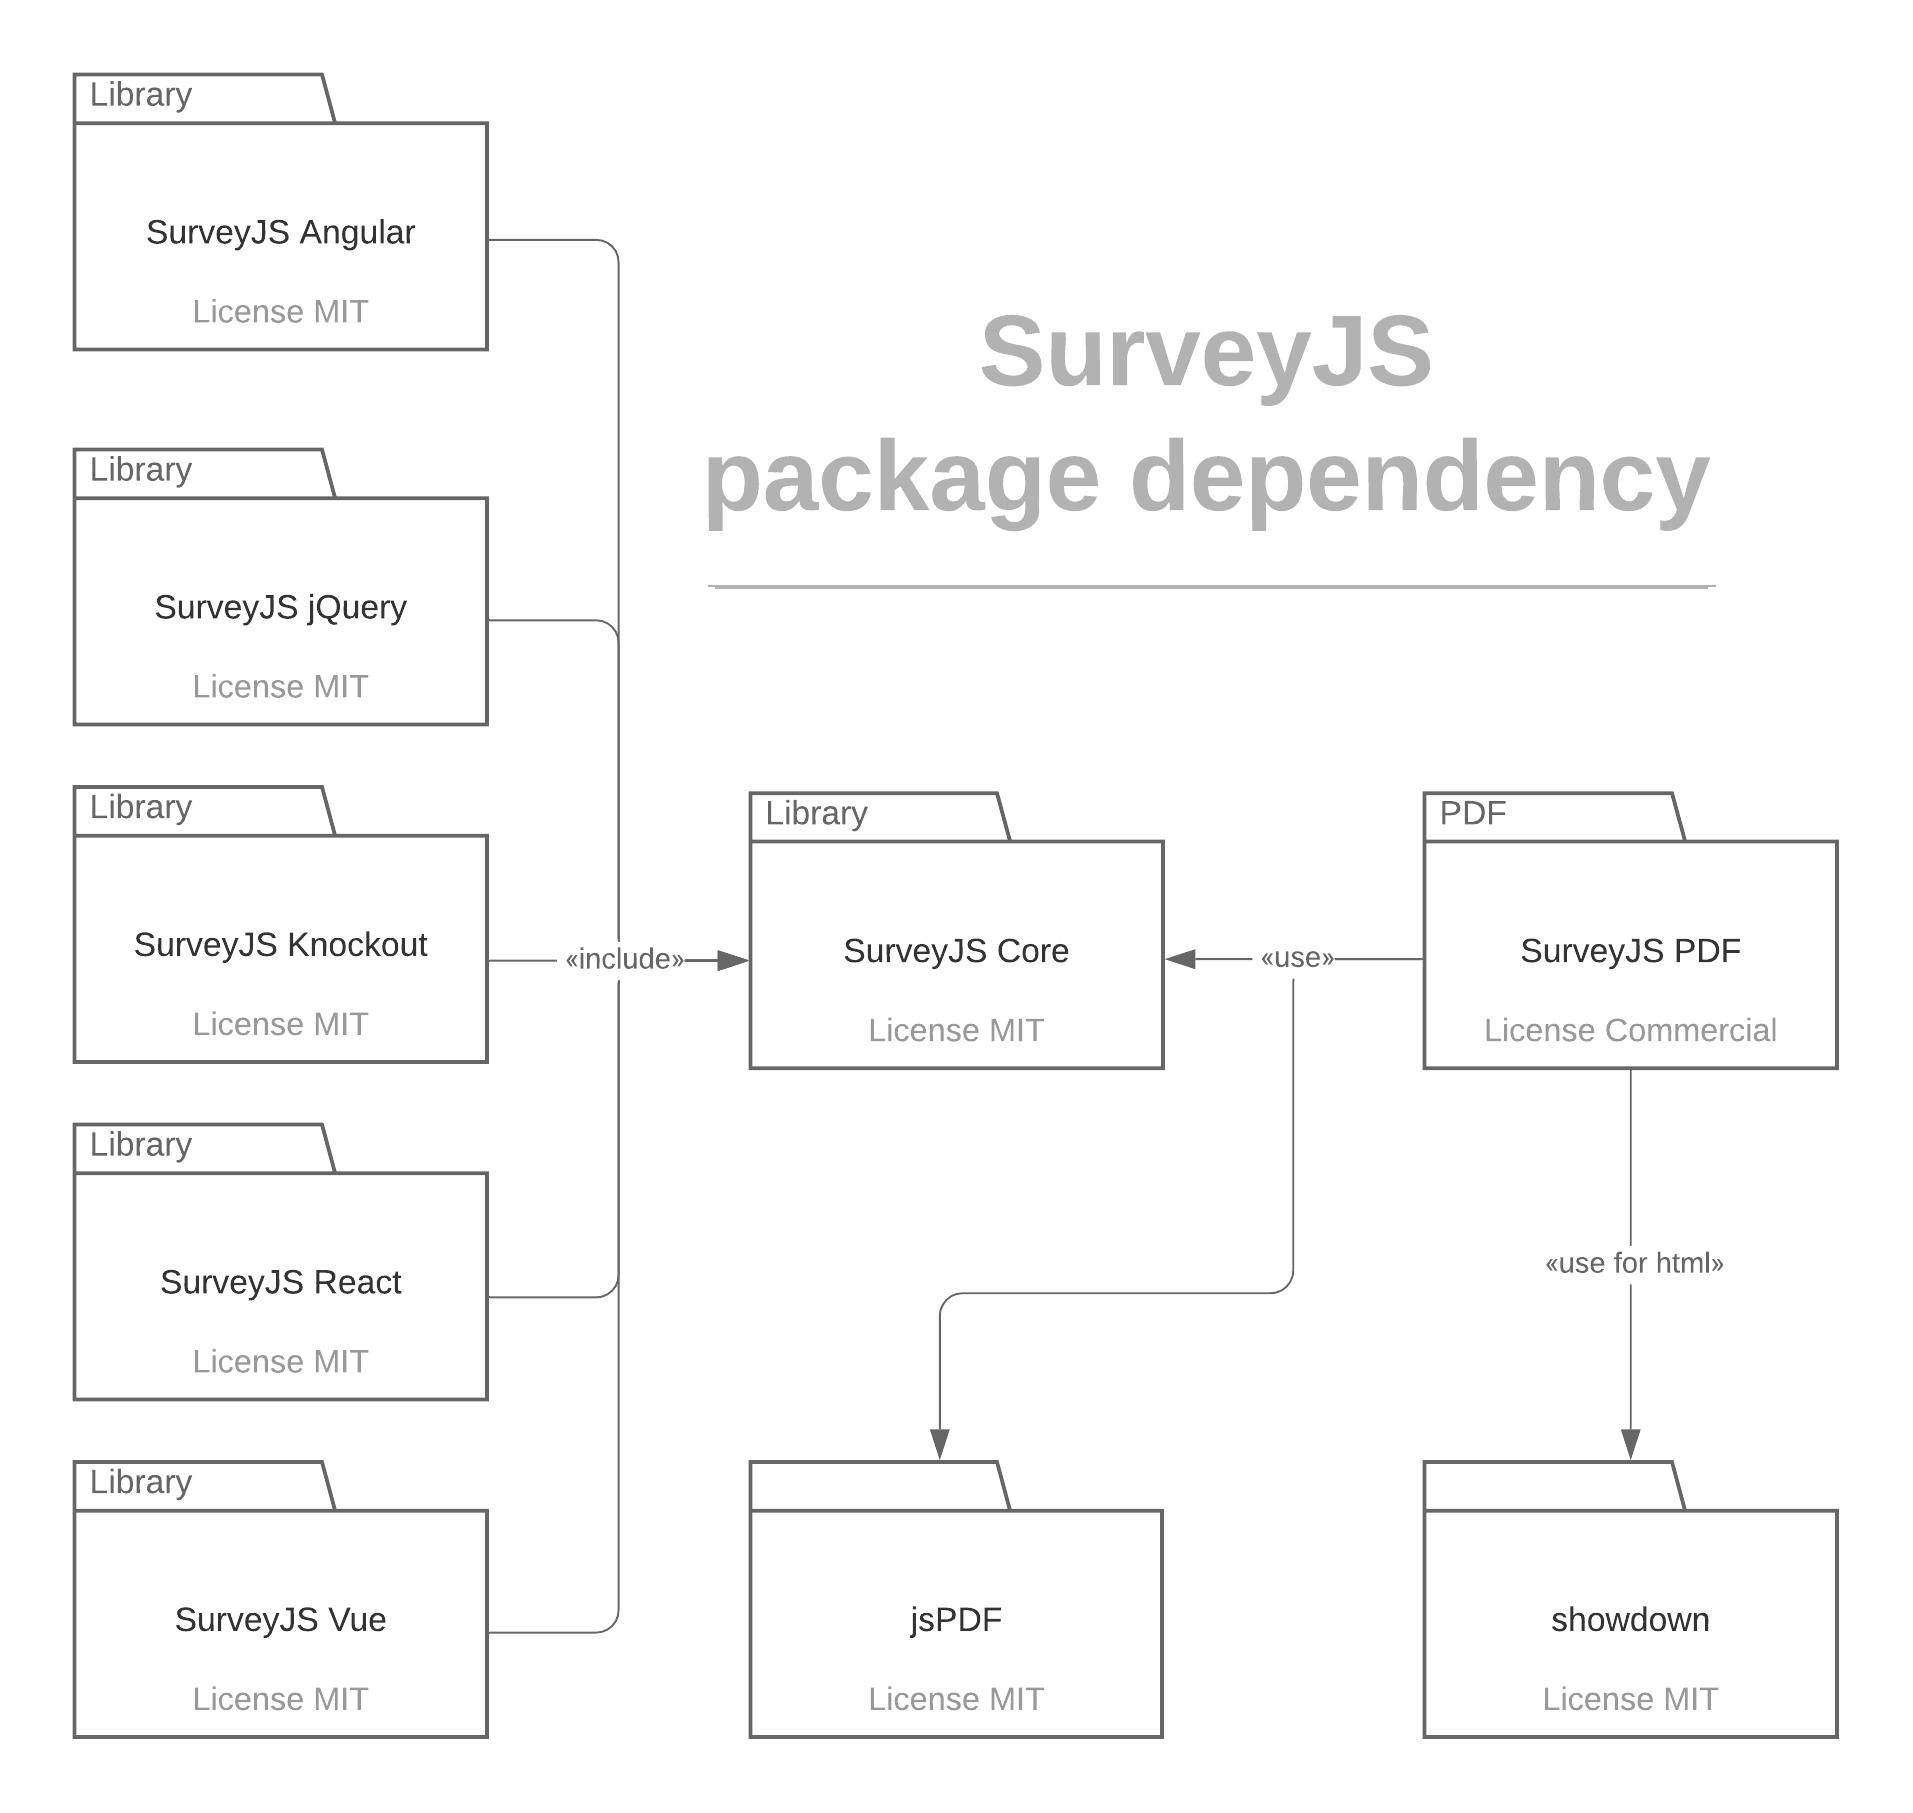 SurveyJS package dependency